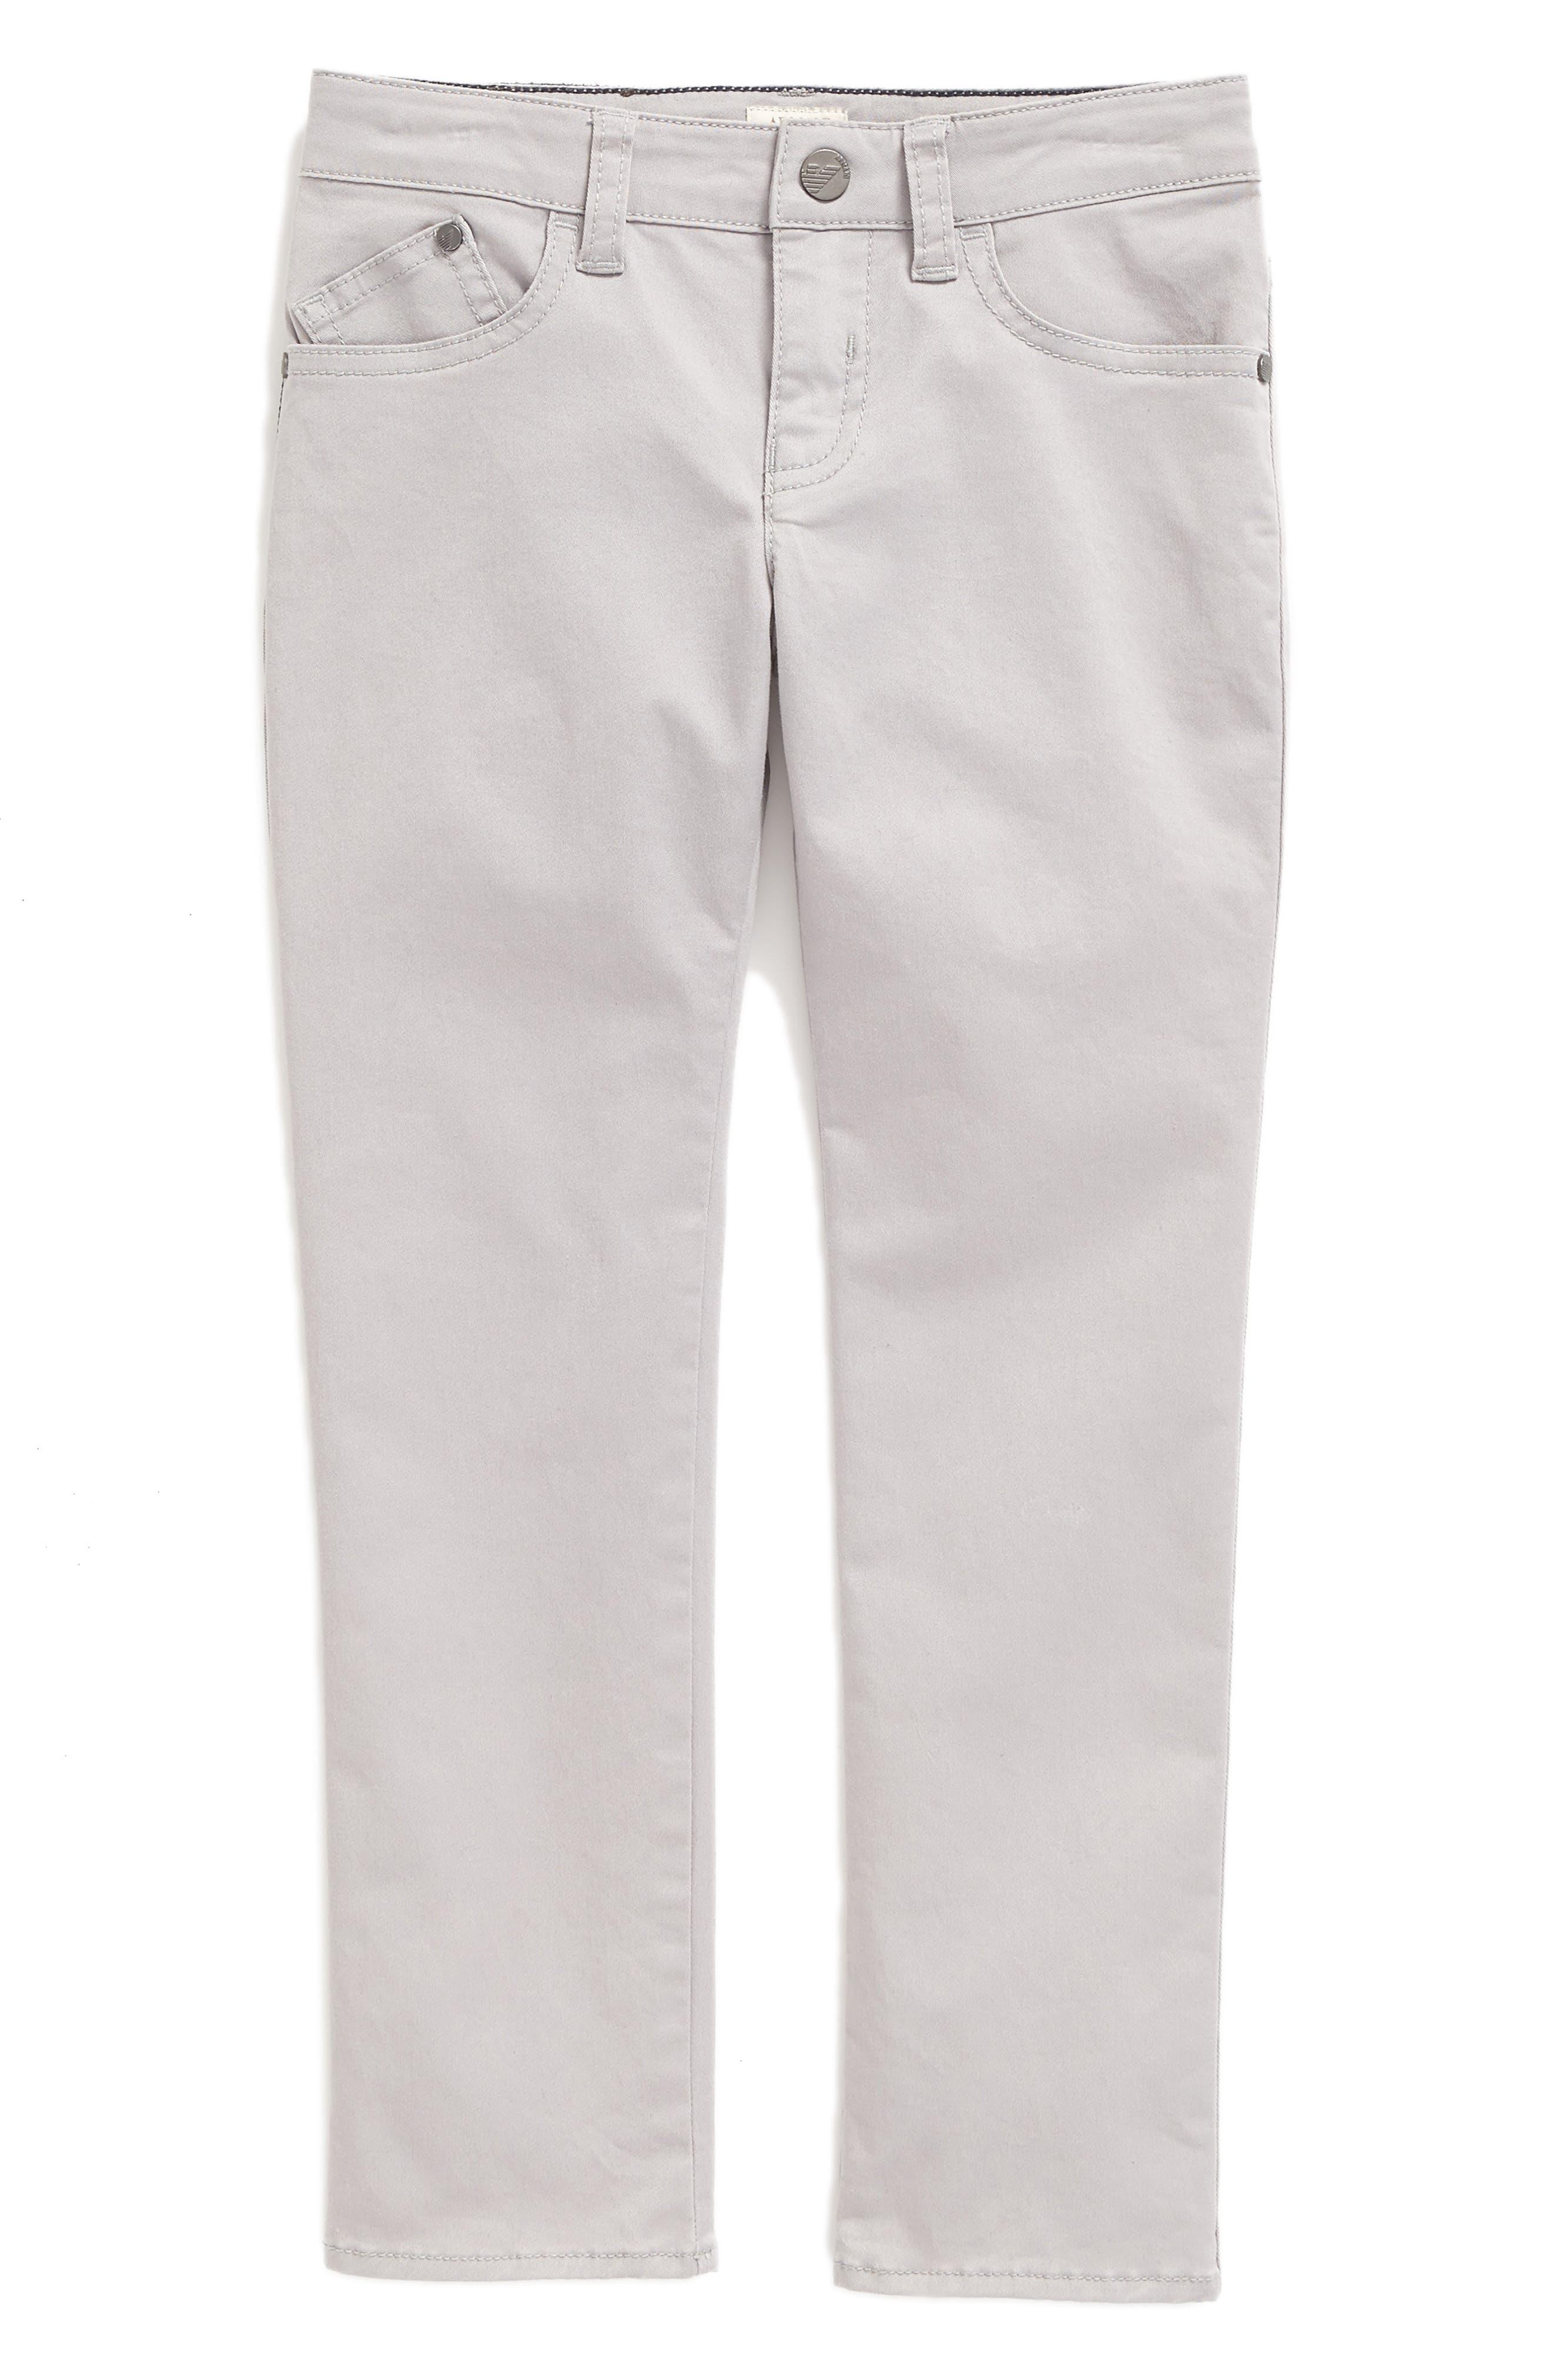 ARMANI JUNIOR Stretch Cotton Twill Pants